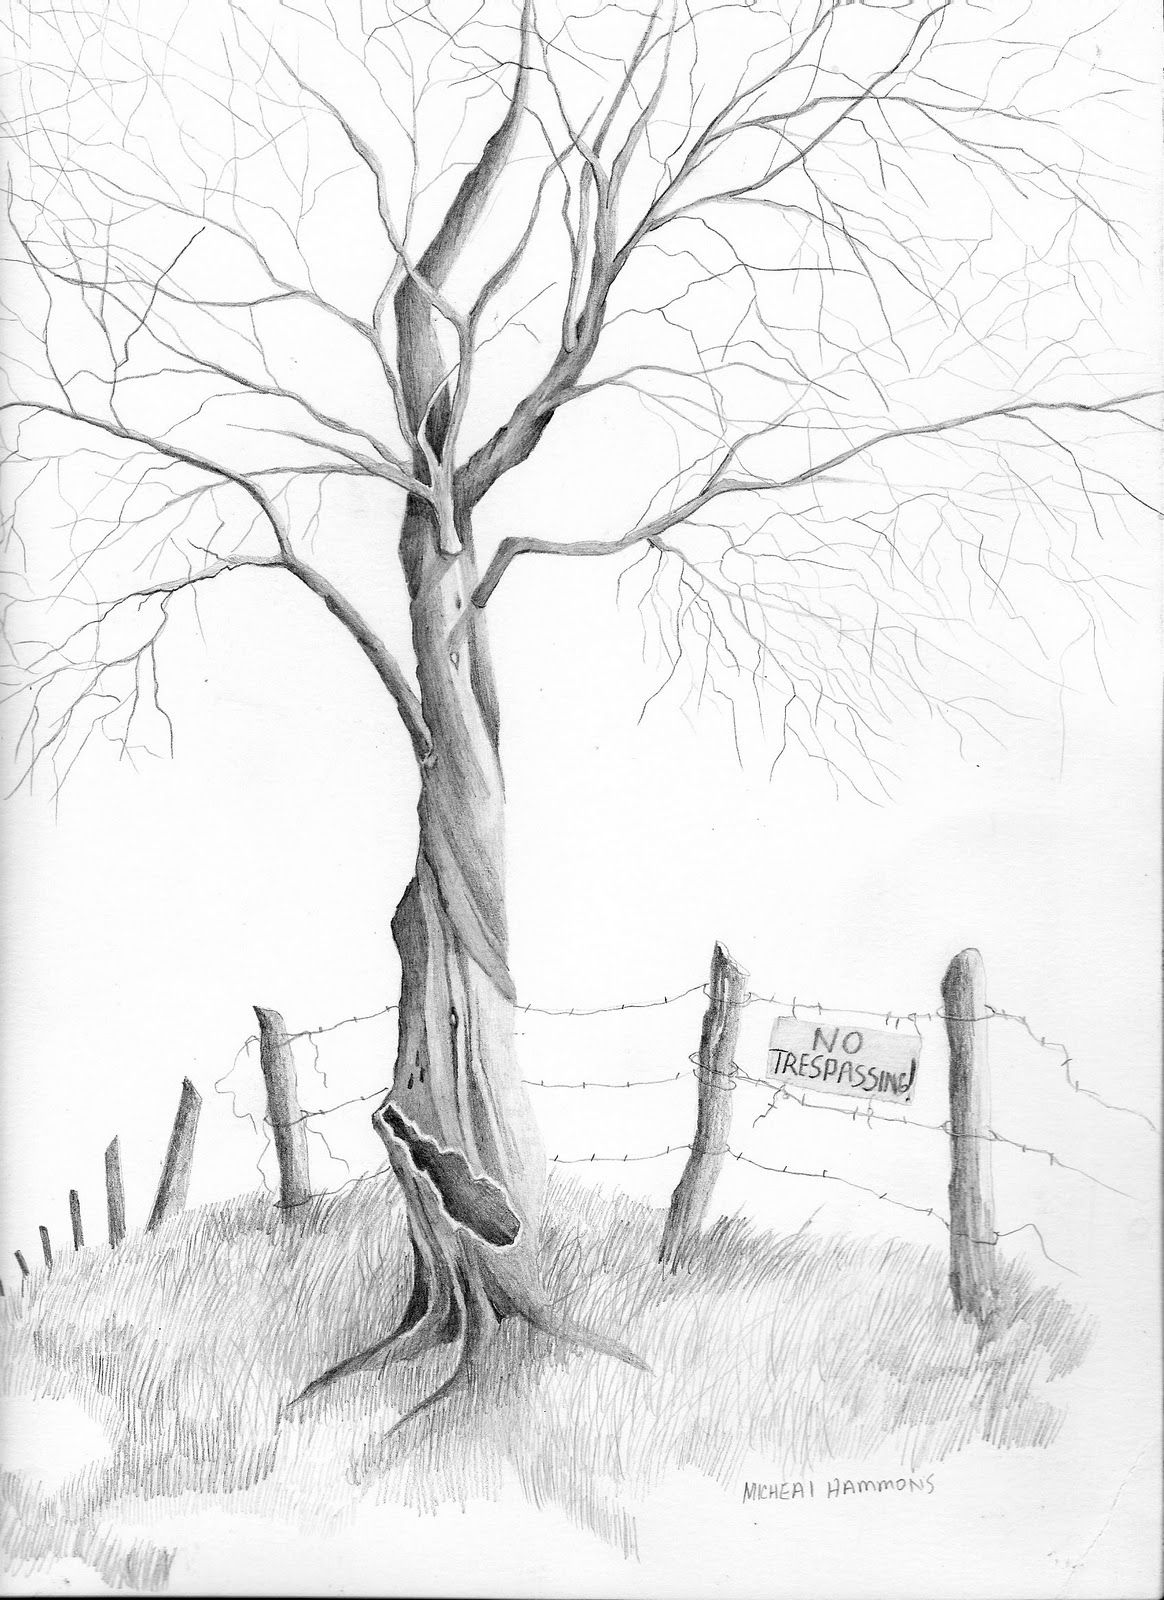 Pencil drawings pencil drawing of tree